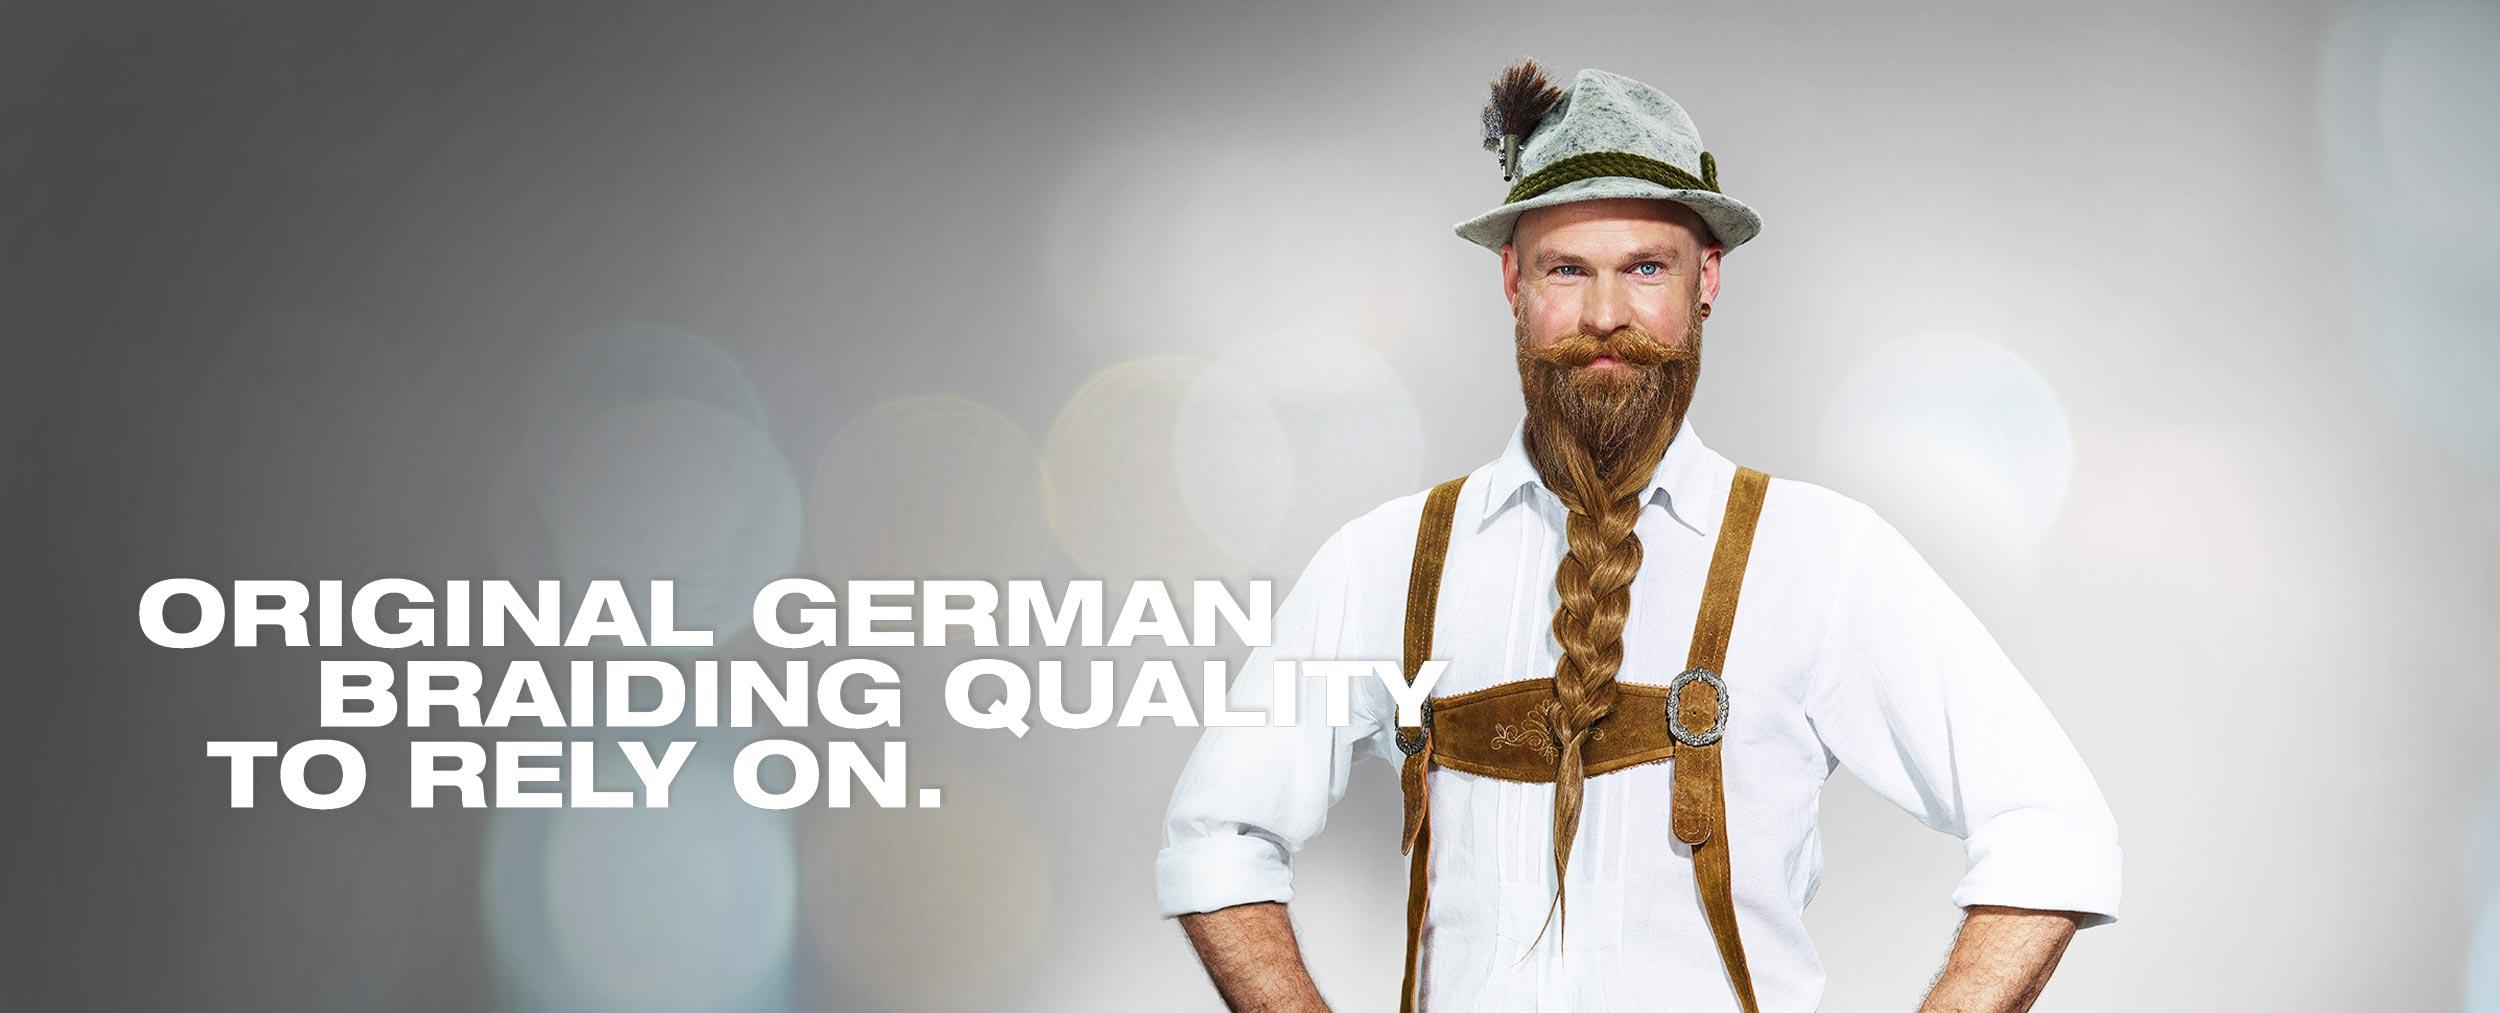 german-braiding-quality-to-rely-on-herzog